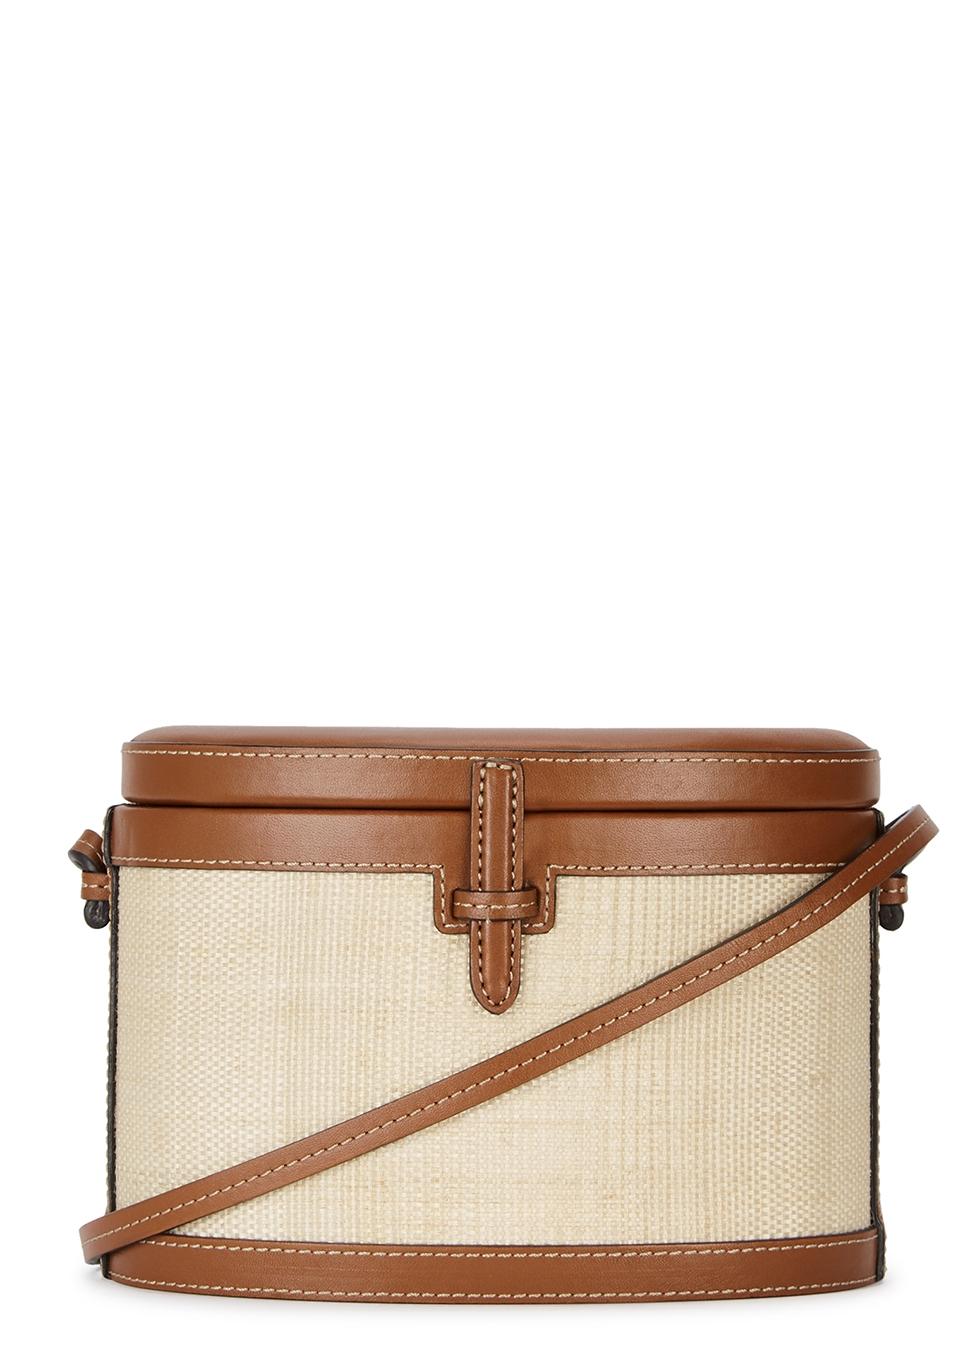 Brown leather bucket bag - Hunting Season